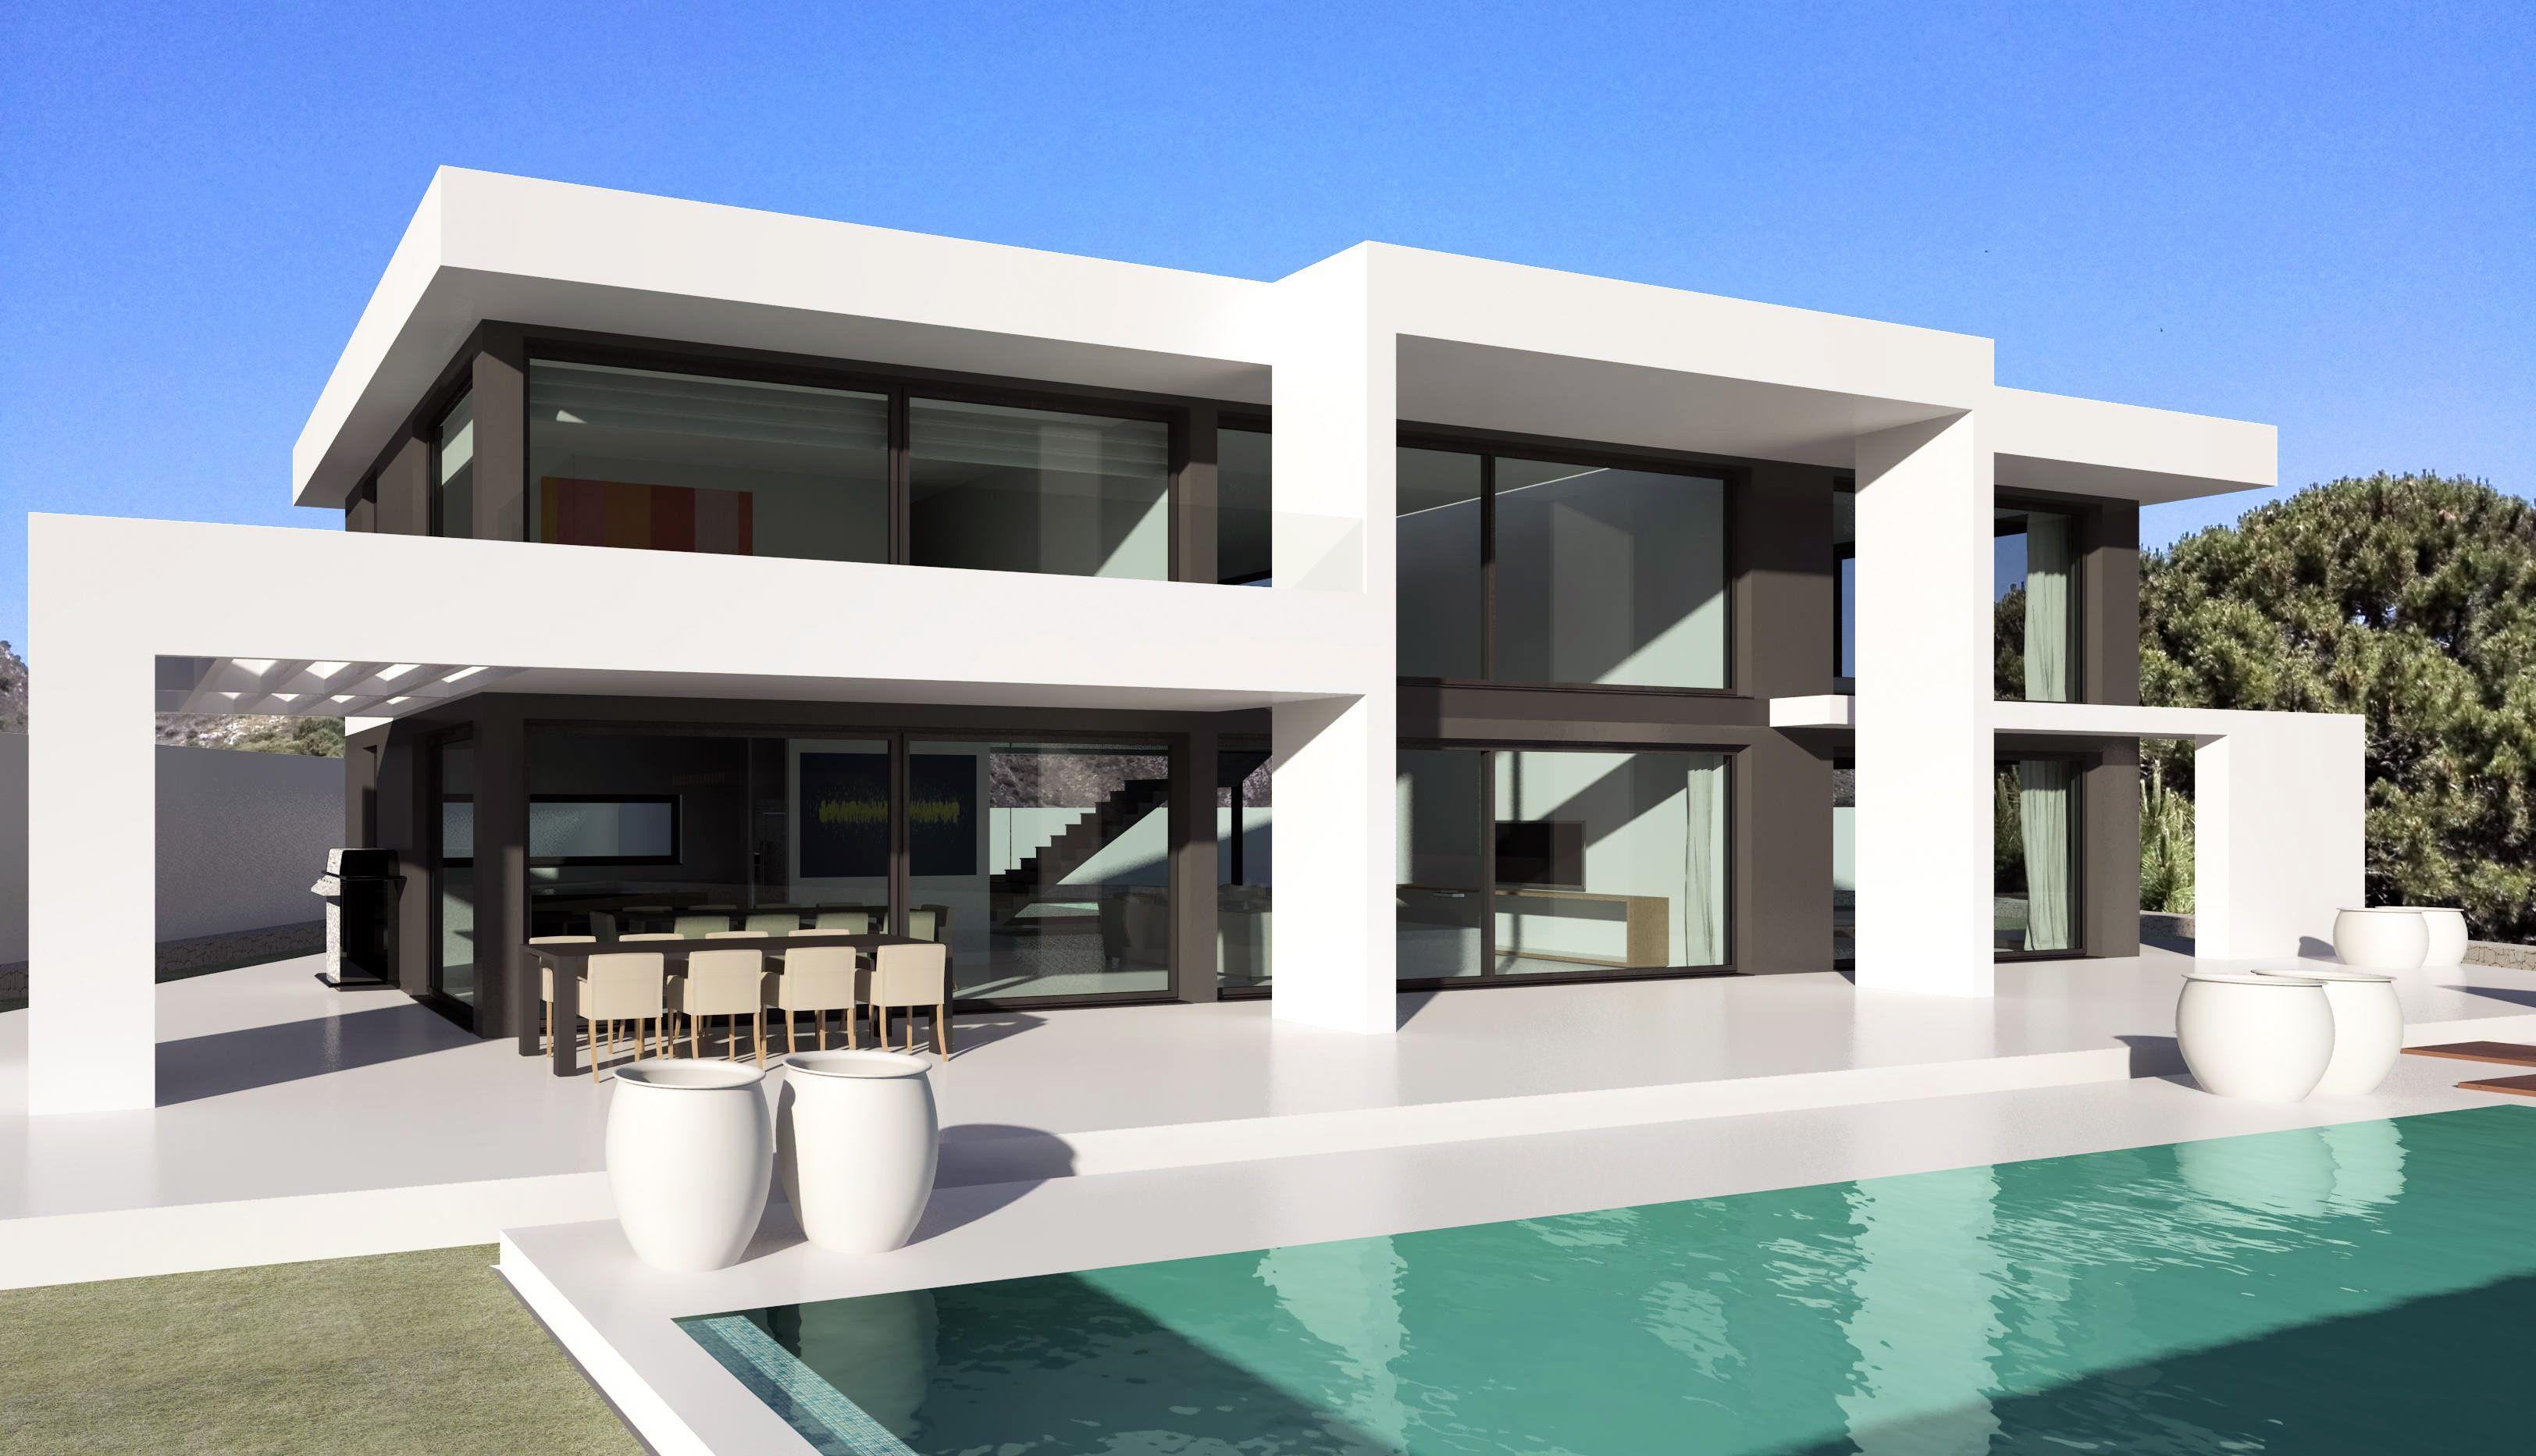 Top Contemporary Architecture Design Ideas Home Items Pinterest